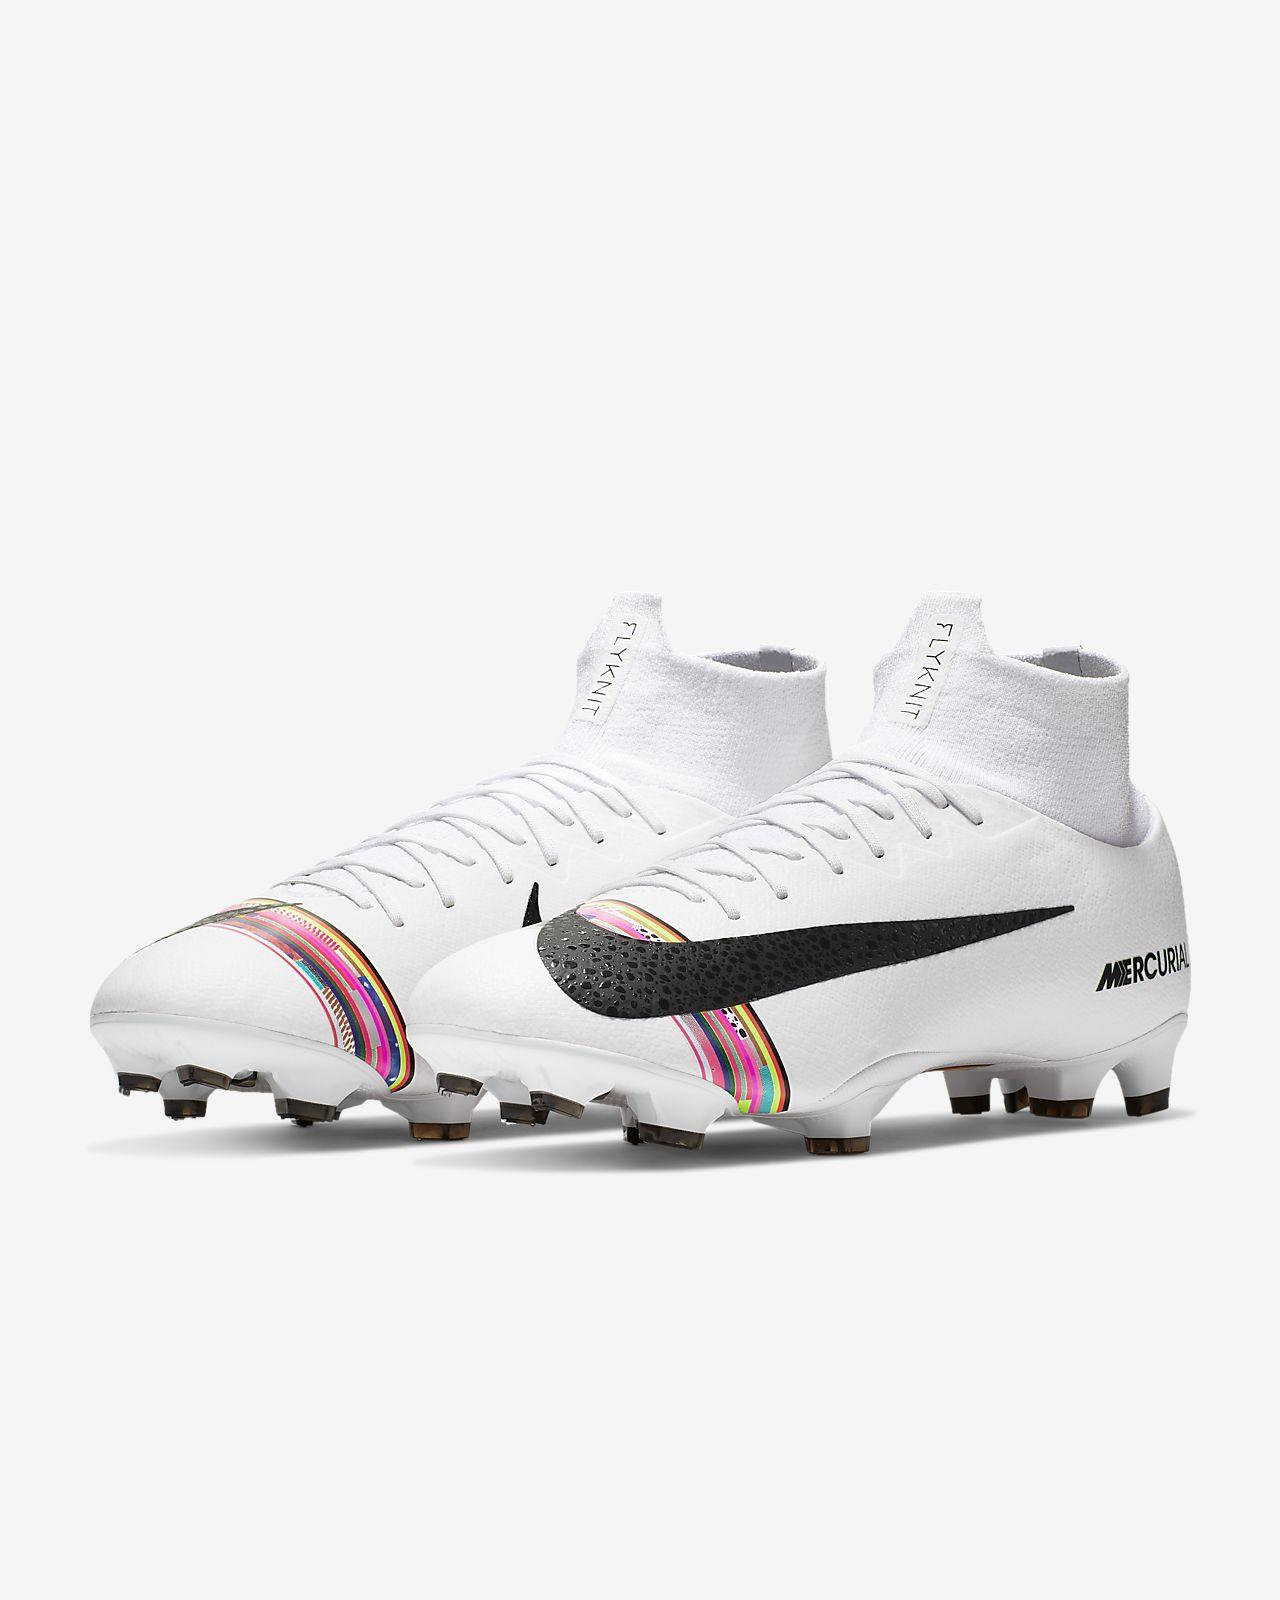 De Fútbol Firme Para 6 Lvl Nike Pro Fg Up Botas Superfly Terreno nwP8OkN0X